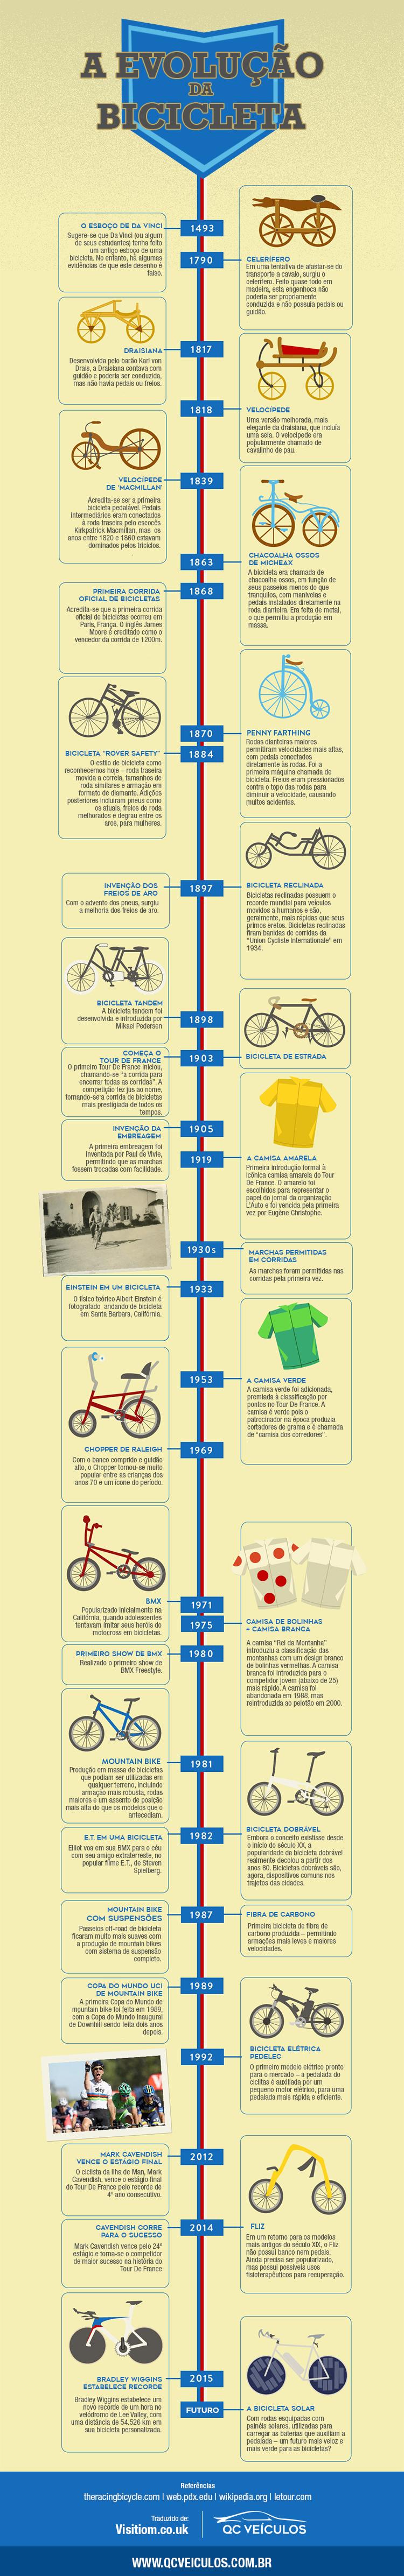 infografico-evolucao-bicicletas